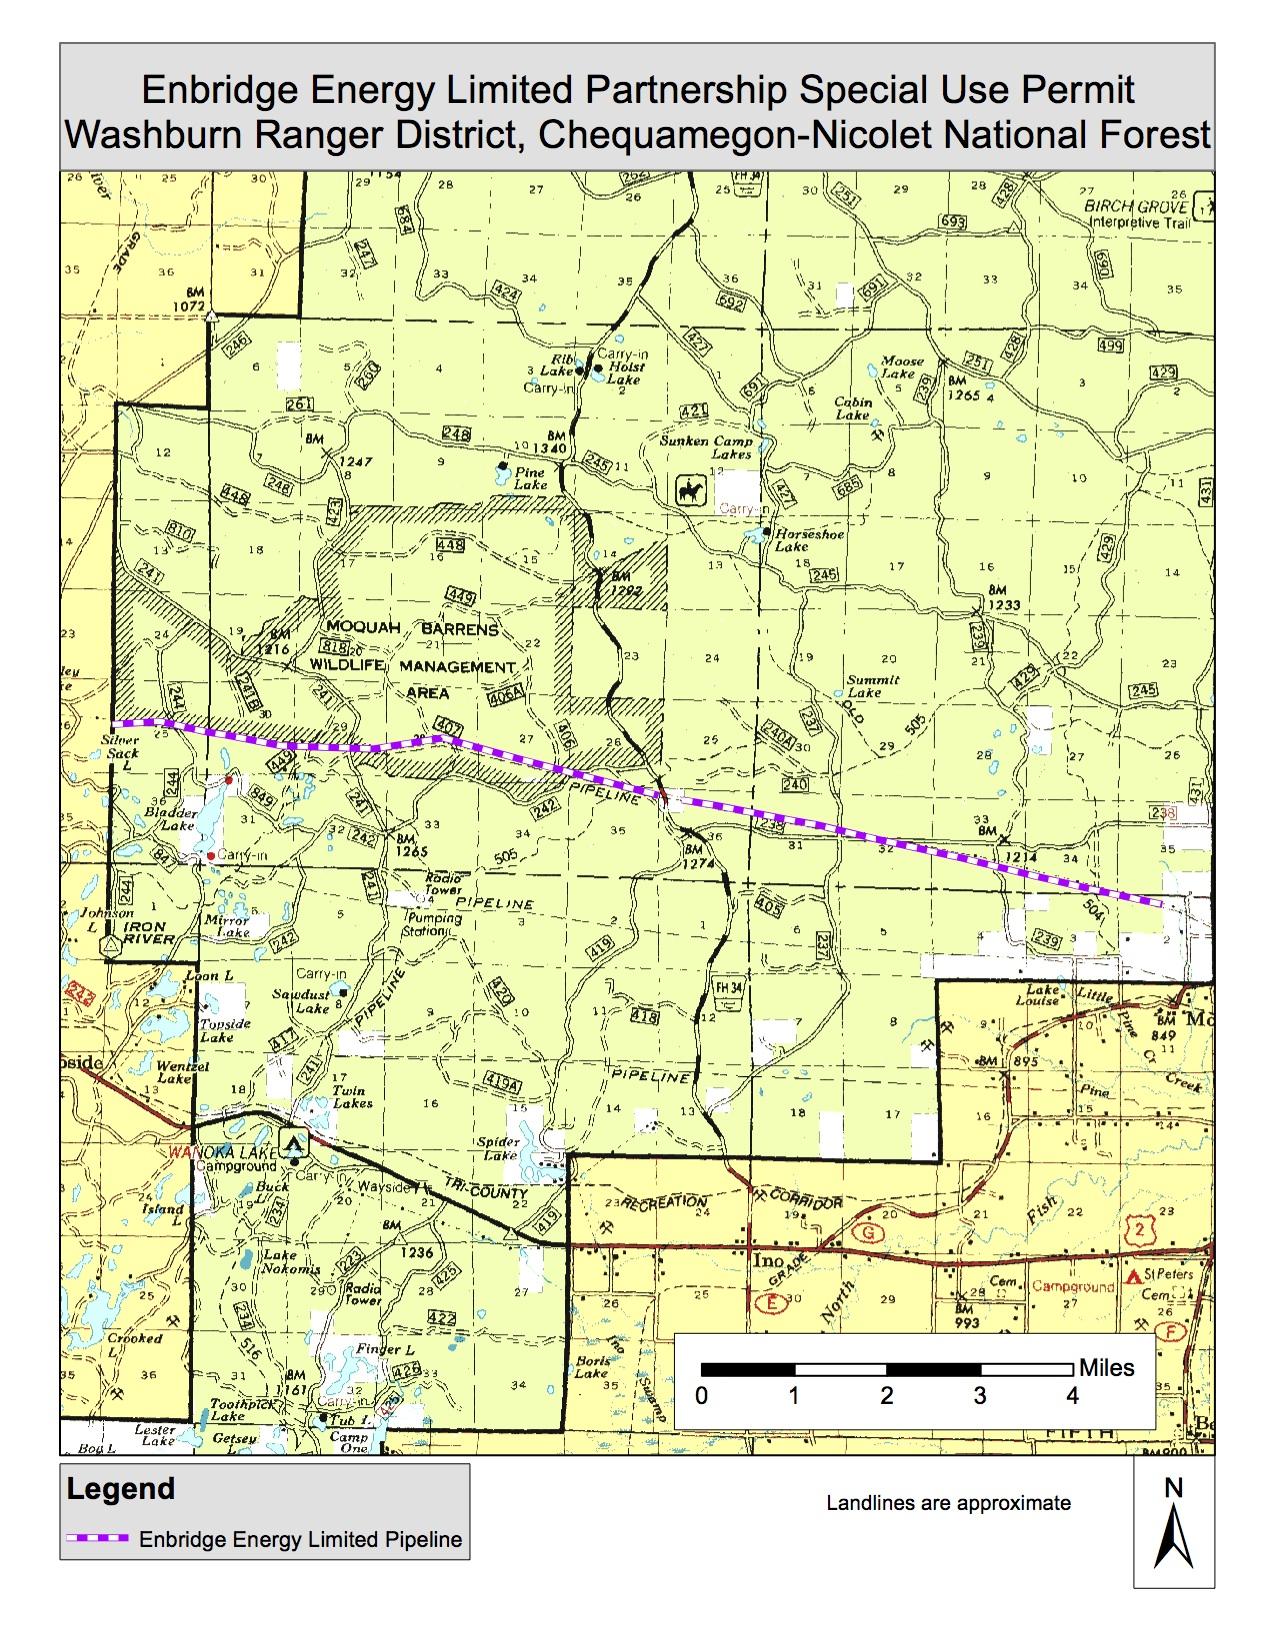 Enbridge Line #5 Pipeline Threatens Great Lakes